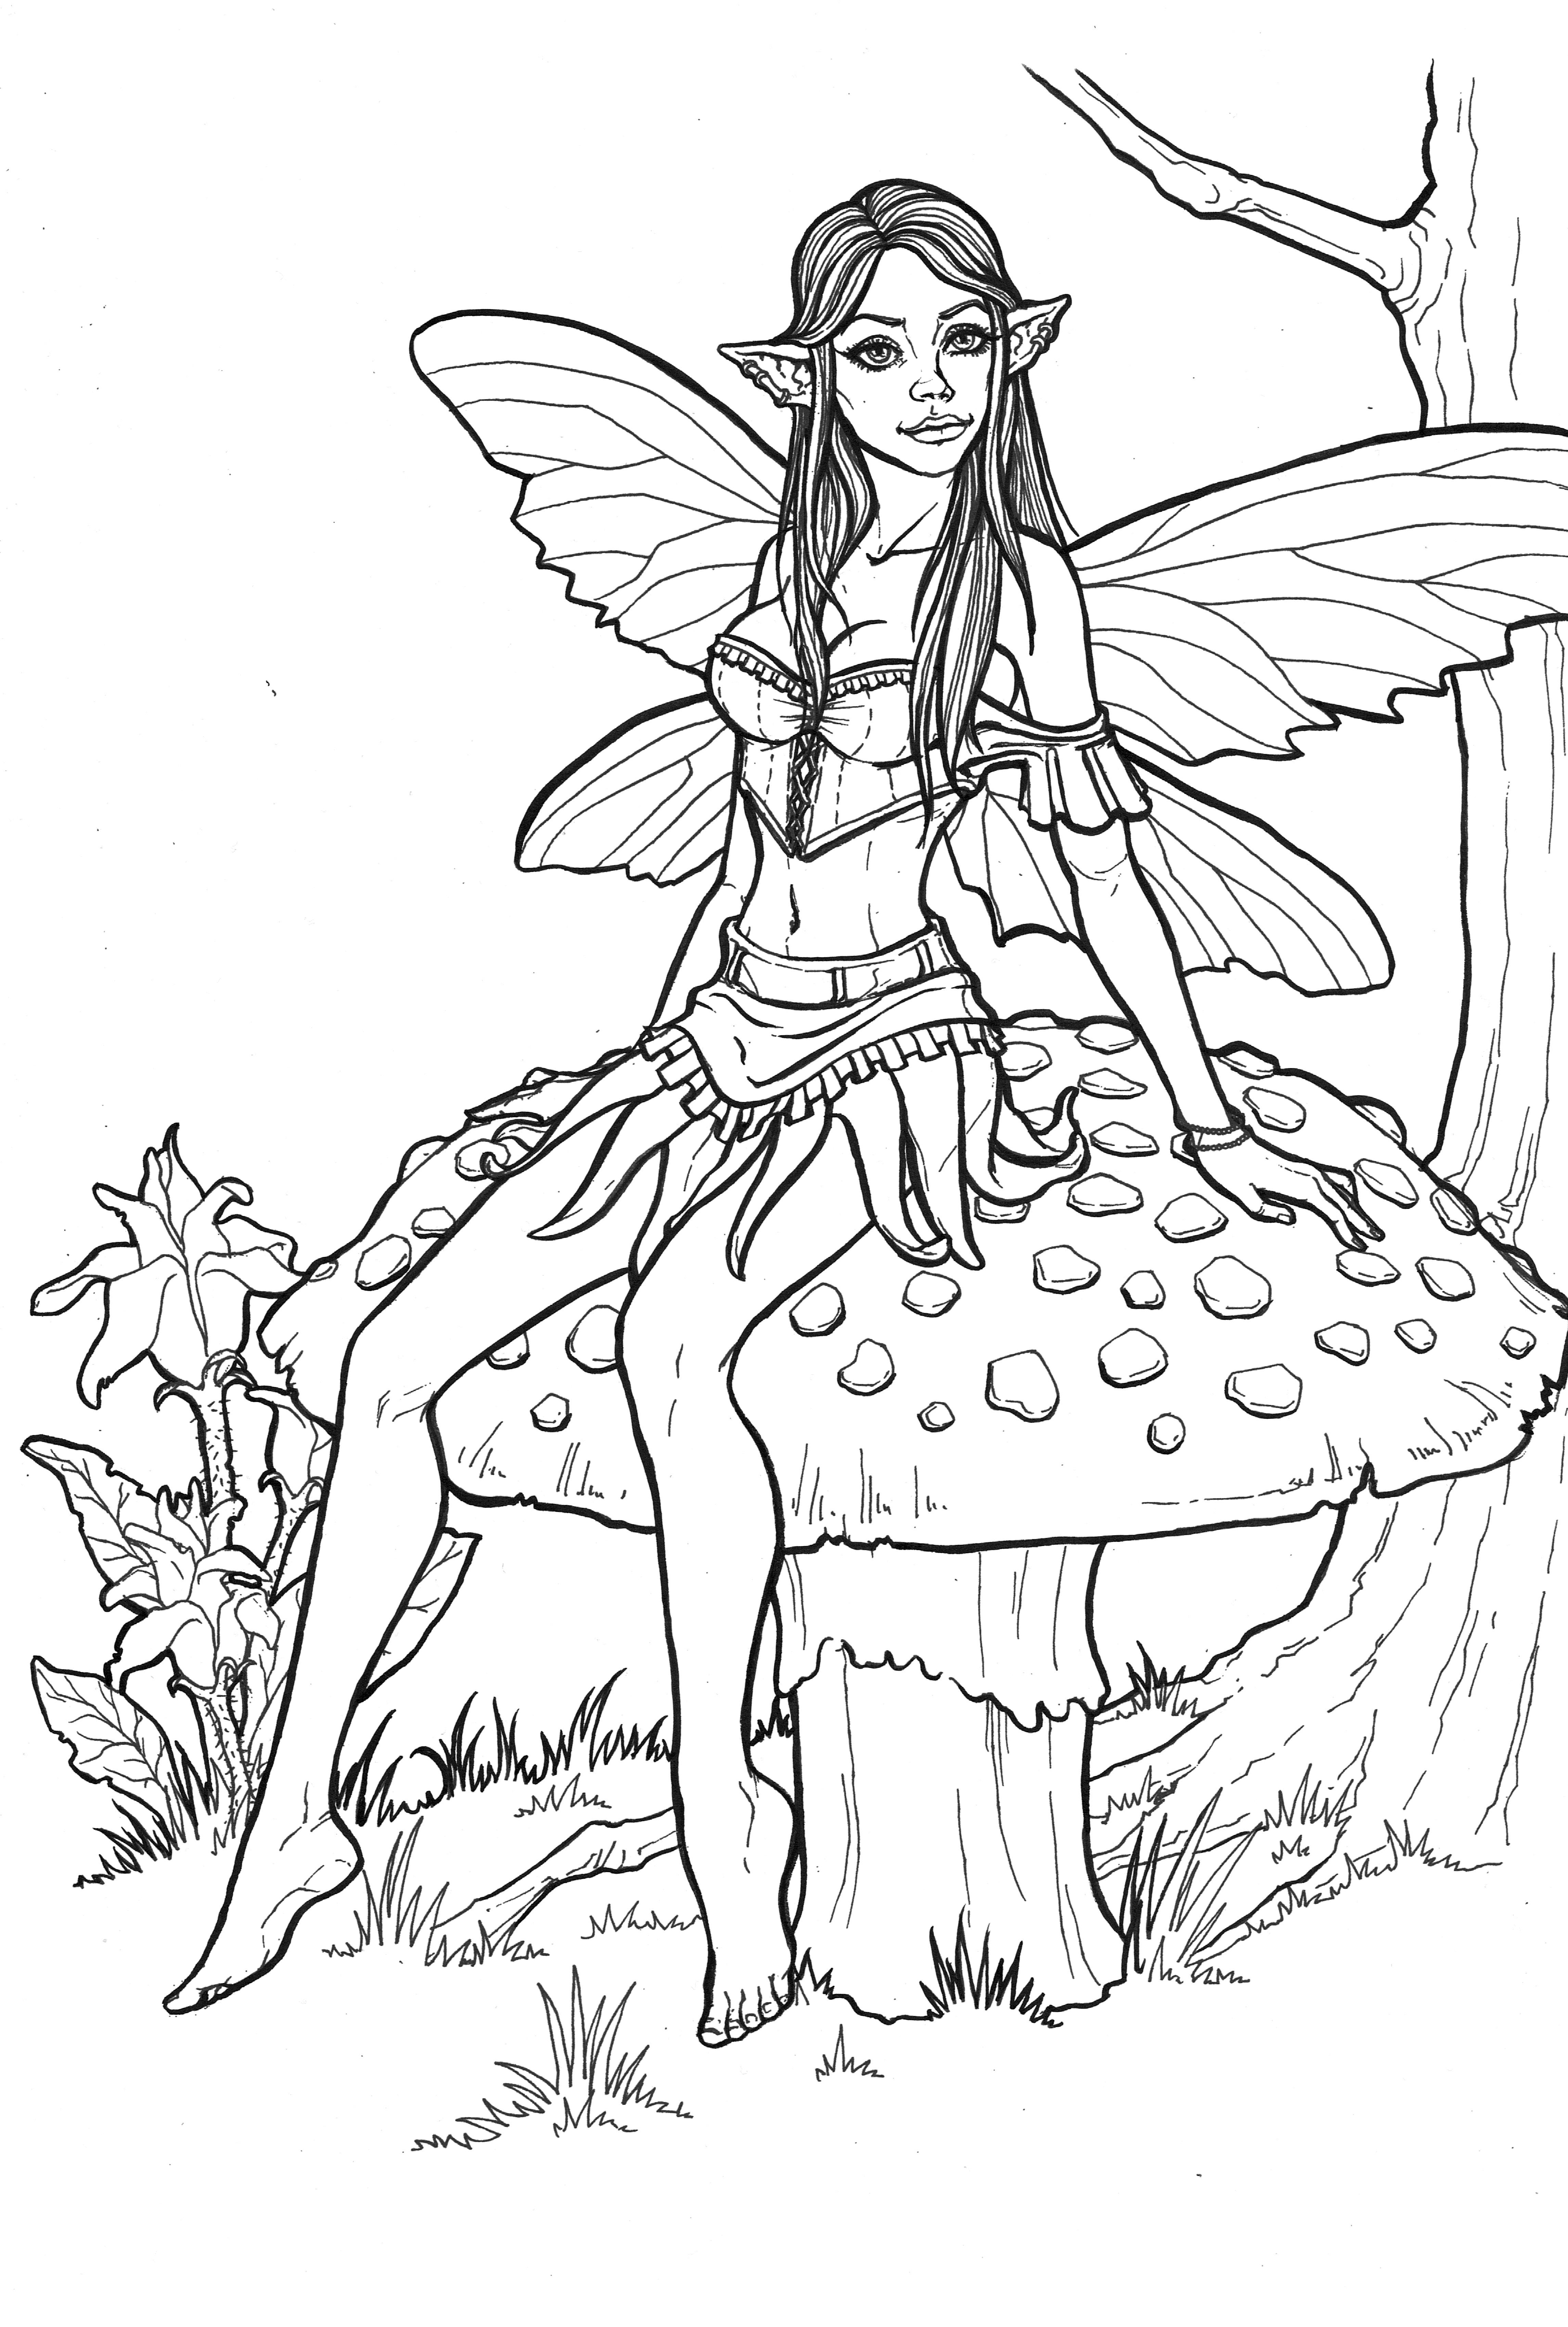 Peacock Drawing In Pencil at GetDrawings | Free download